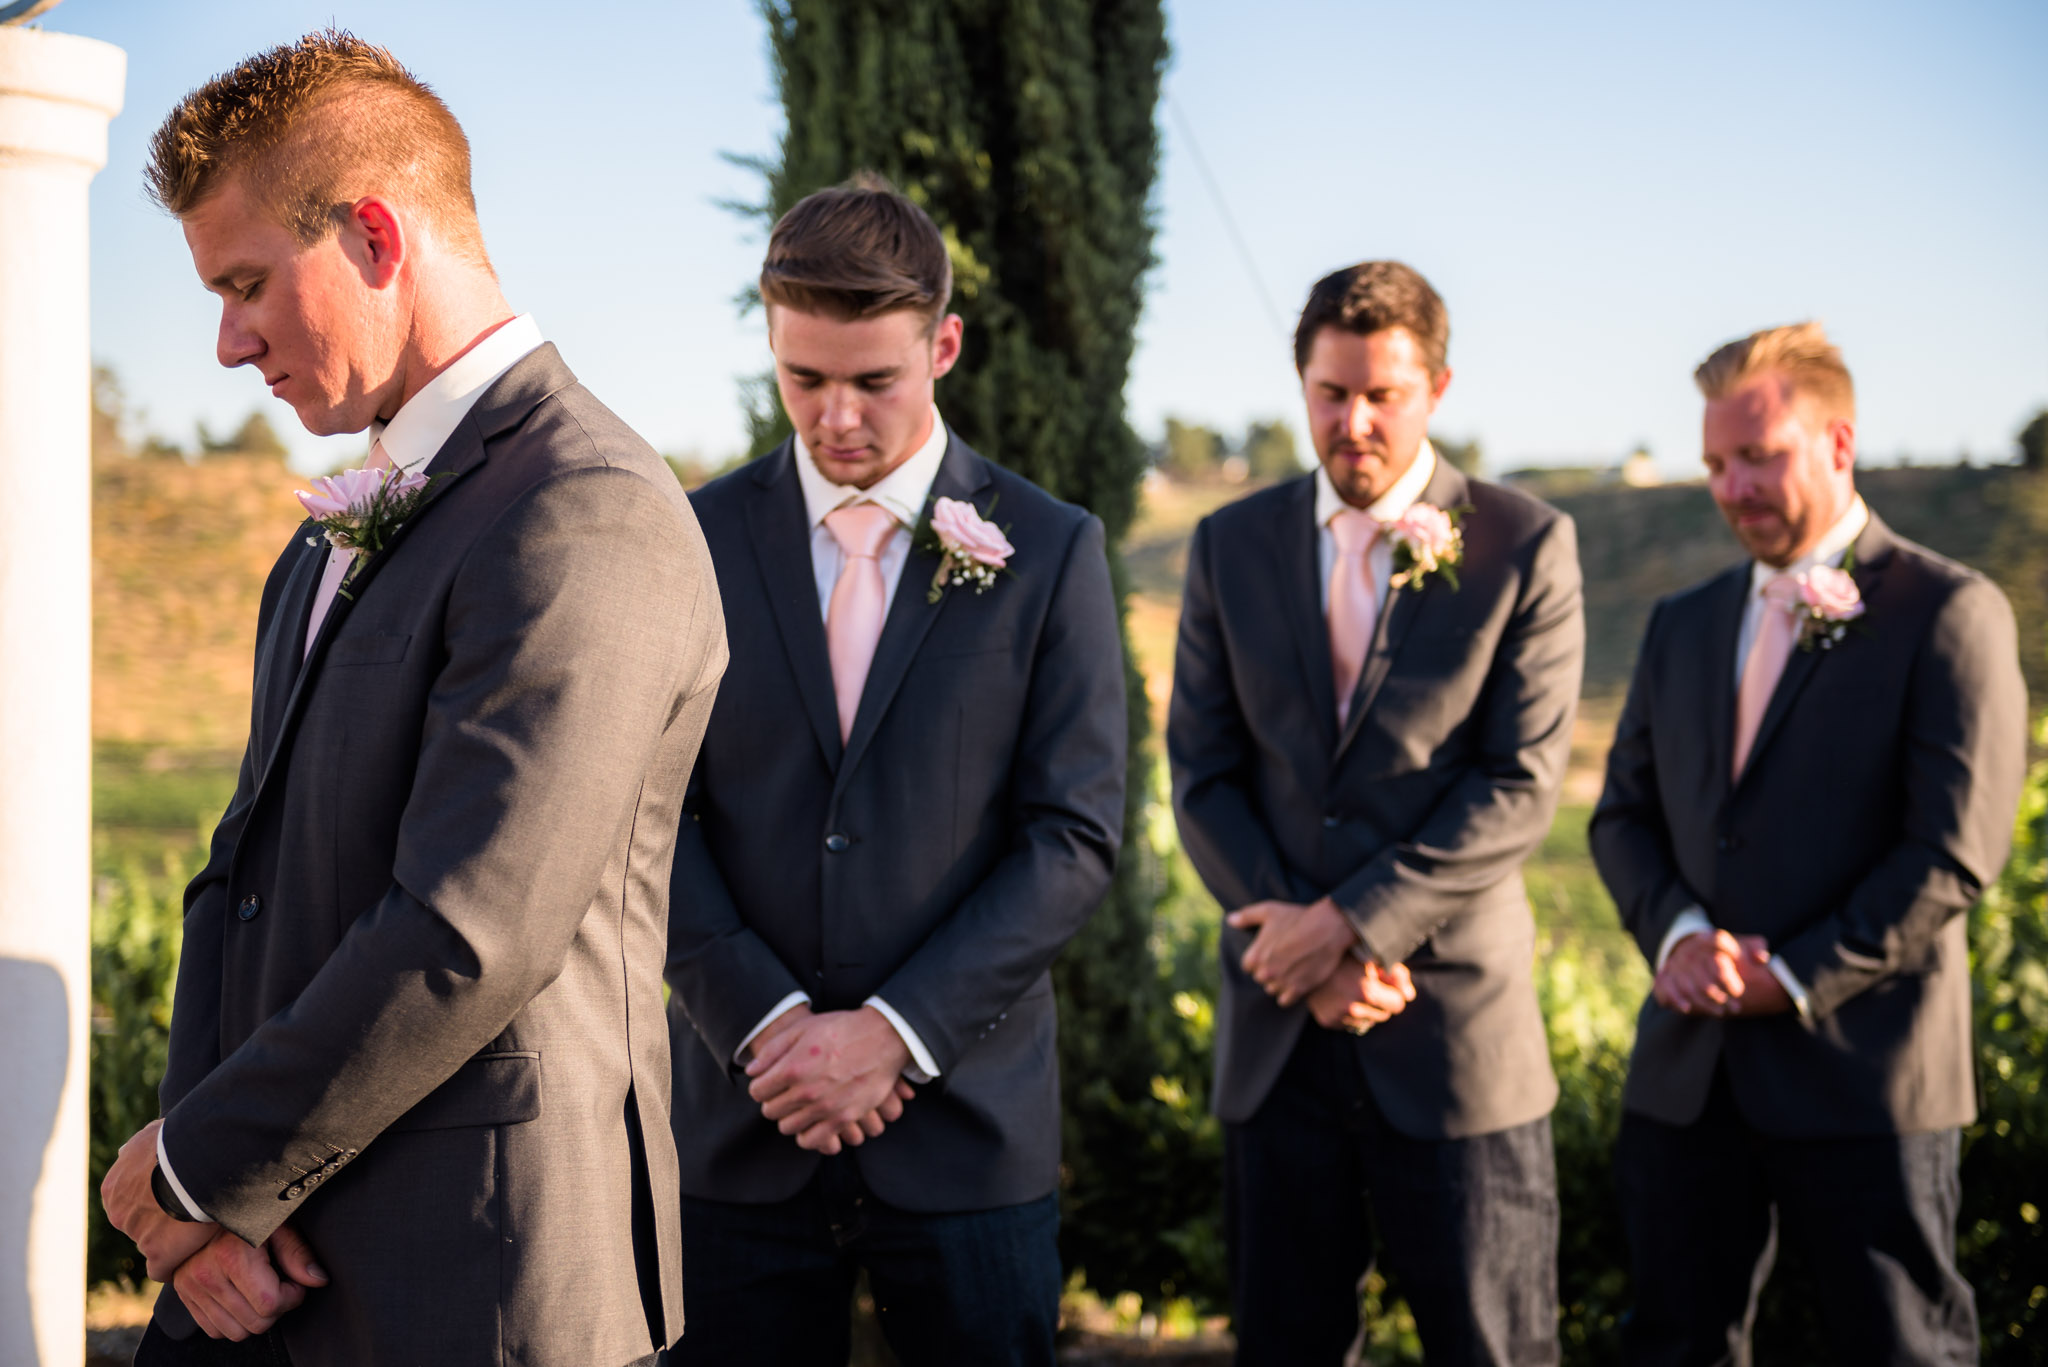 Avensole-Winery-Temecula-Wedding-Josh-and-Olivia-3606.JPG